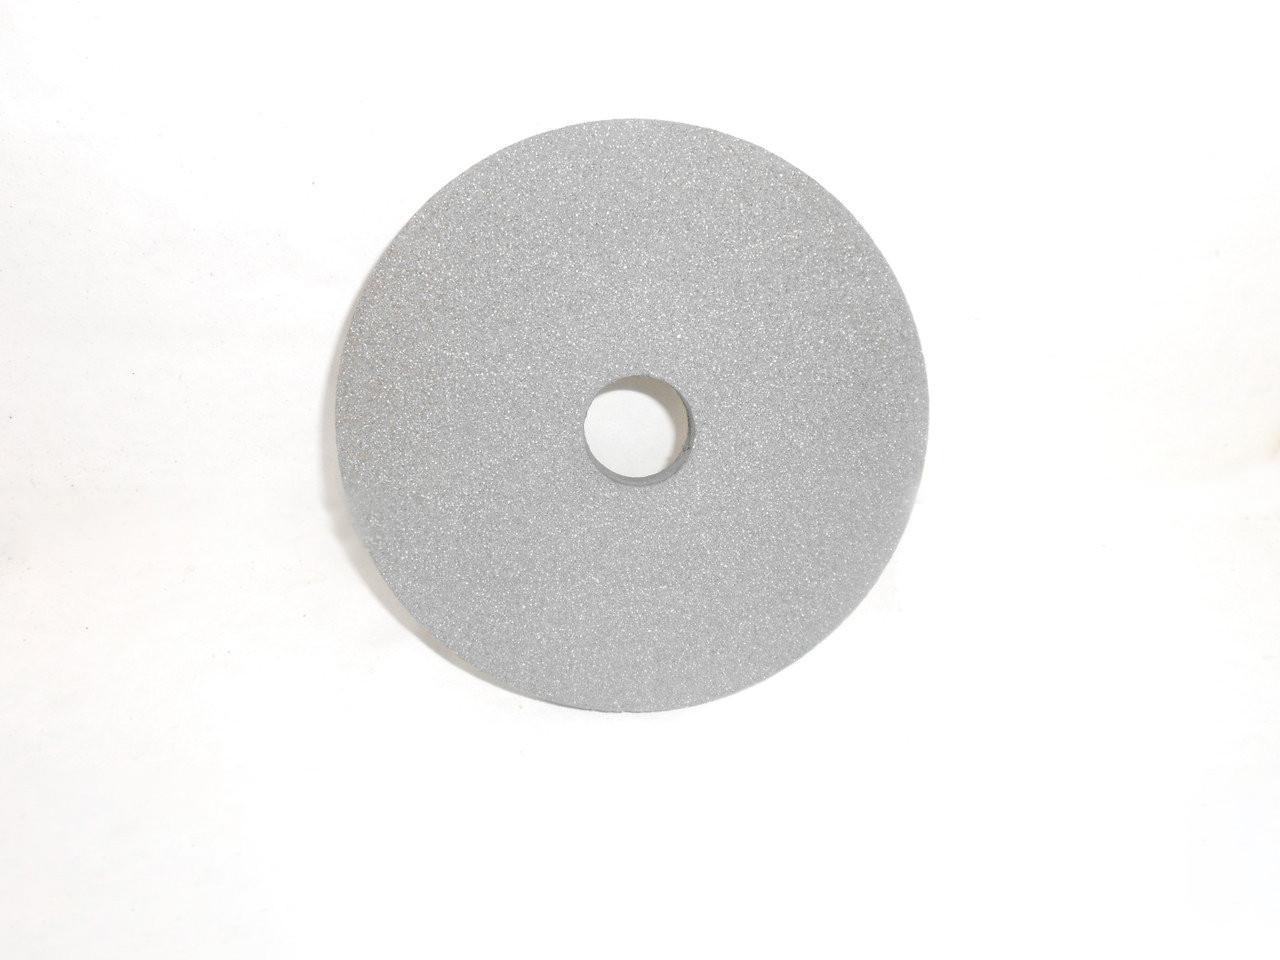 Круг шлифовальный 14А ПП 350х16х127  25 СМ